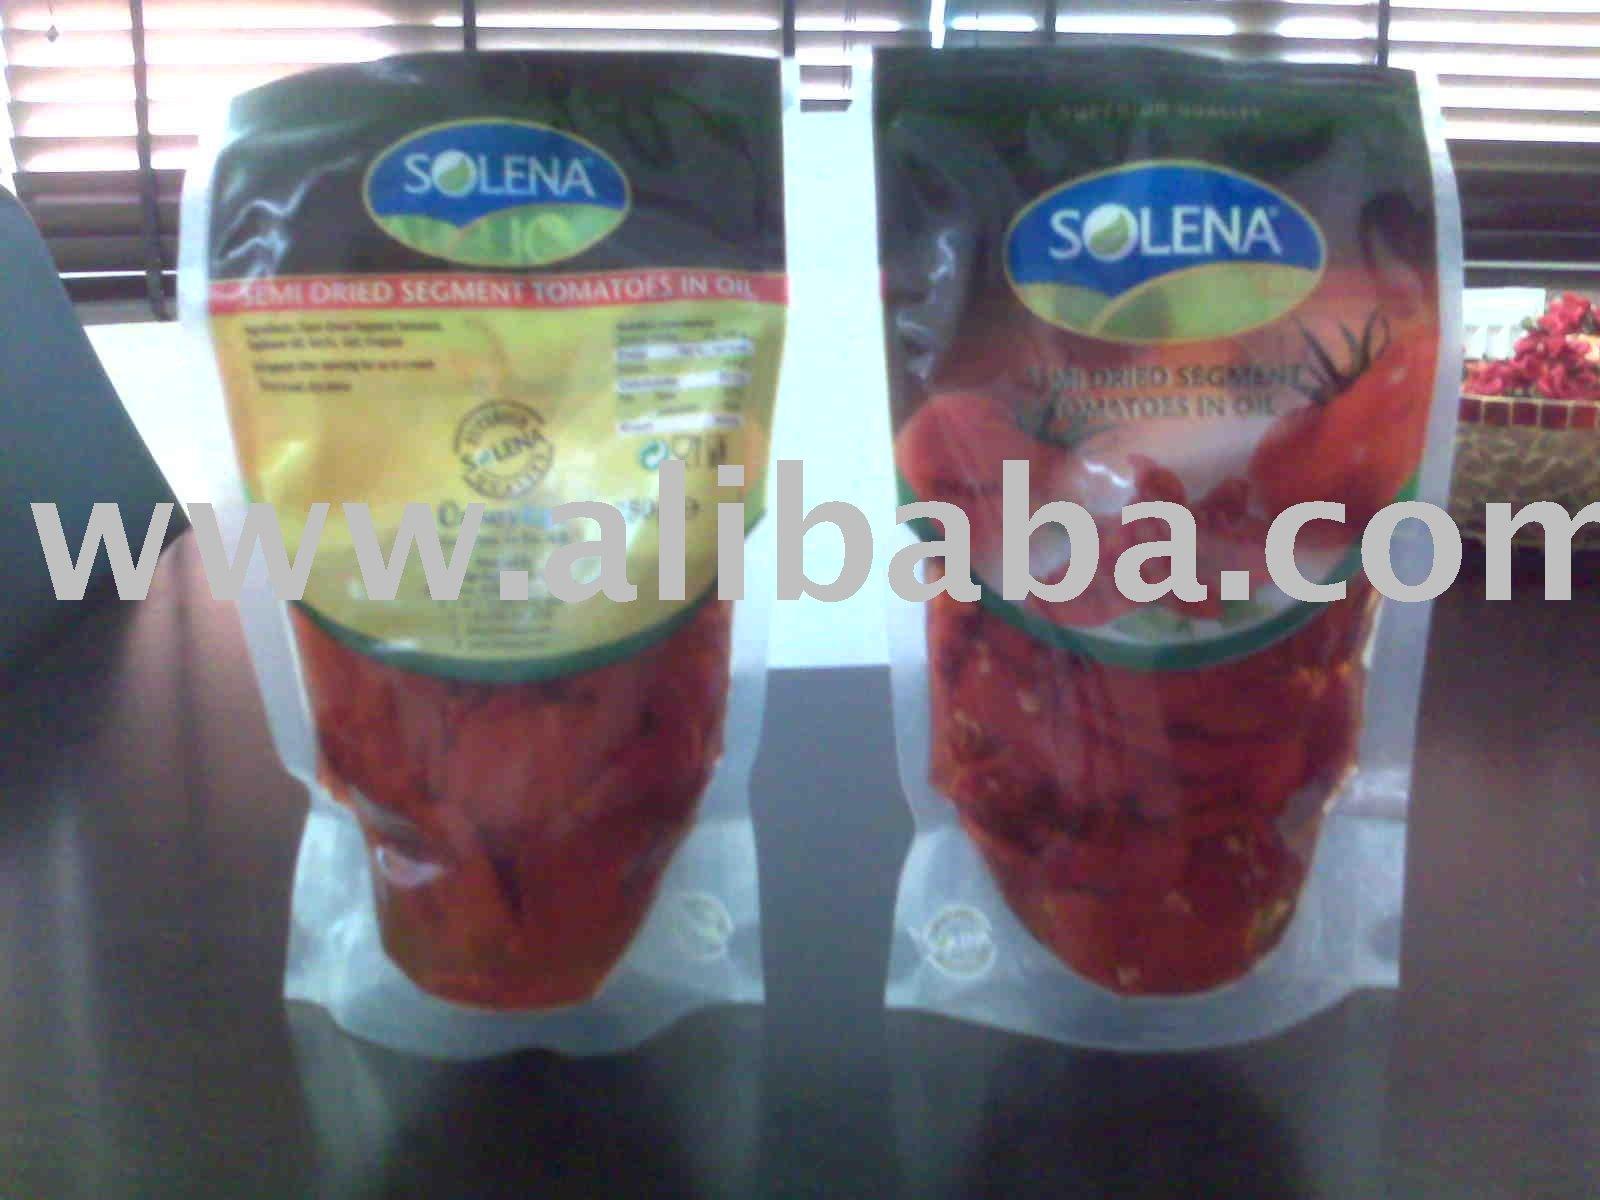 IQF Oven Semi Dried Segment-Cherry Tomatoes-Marinated Oven Semi Dried Tomatoes In Oil-Sun Dried Toma